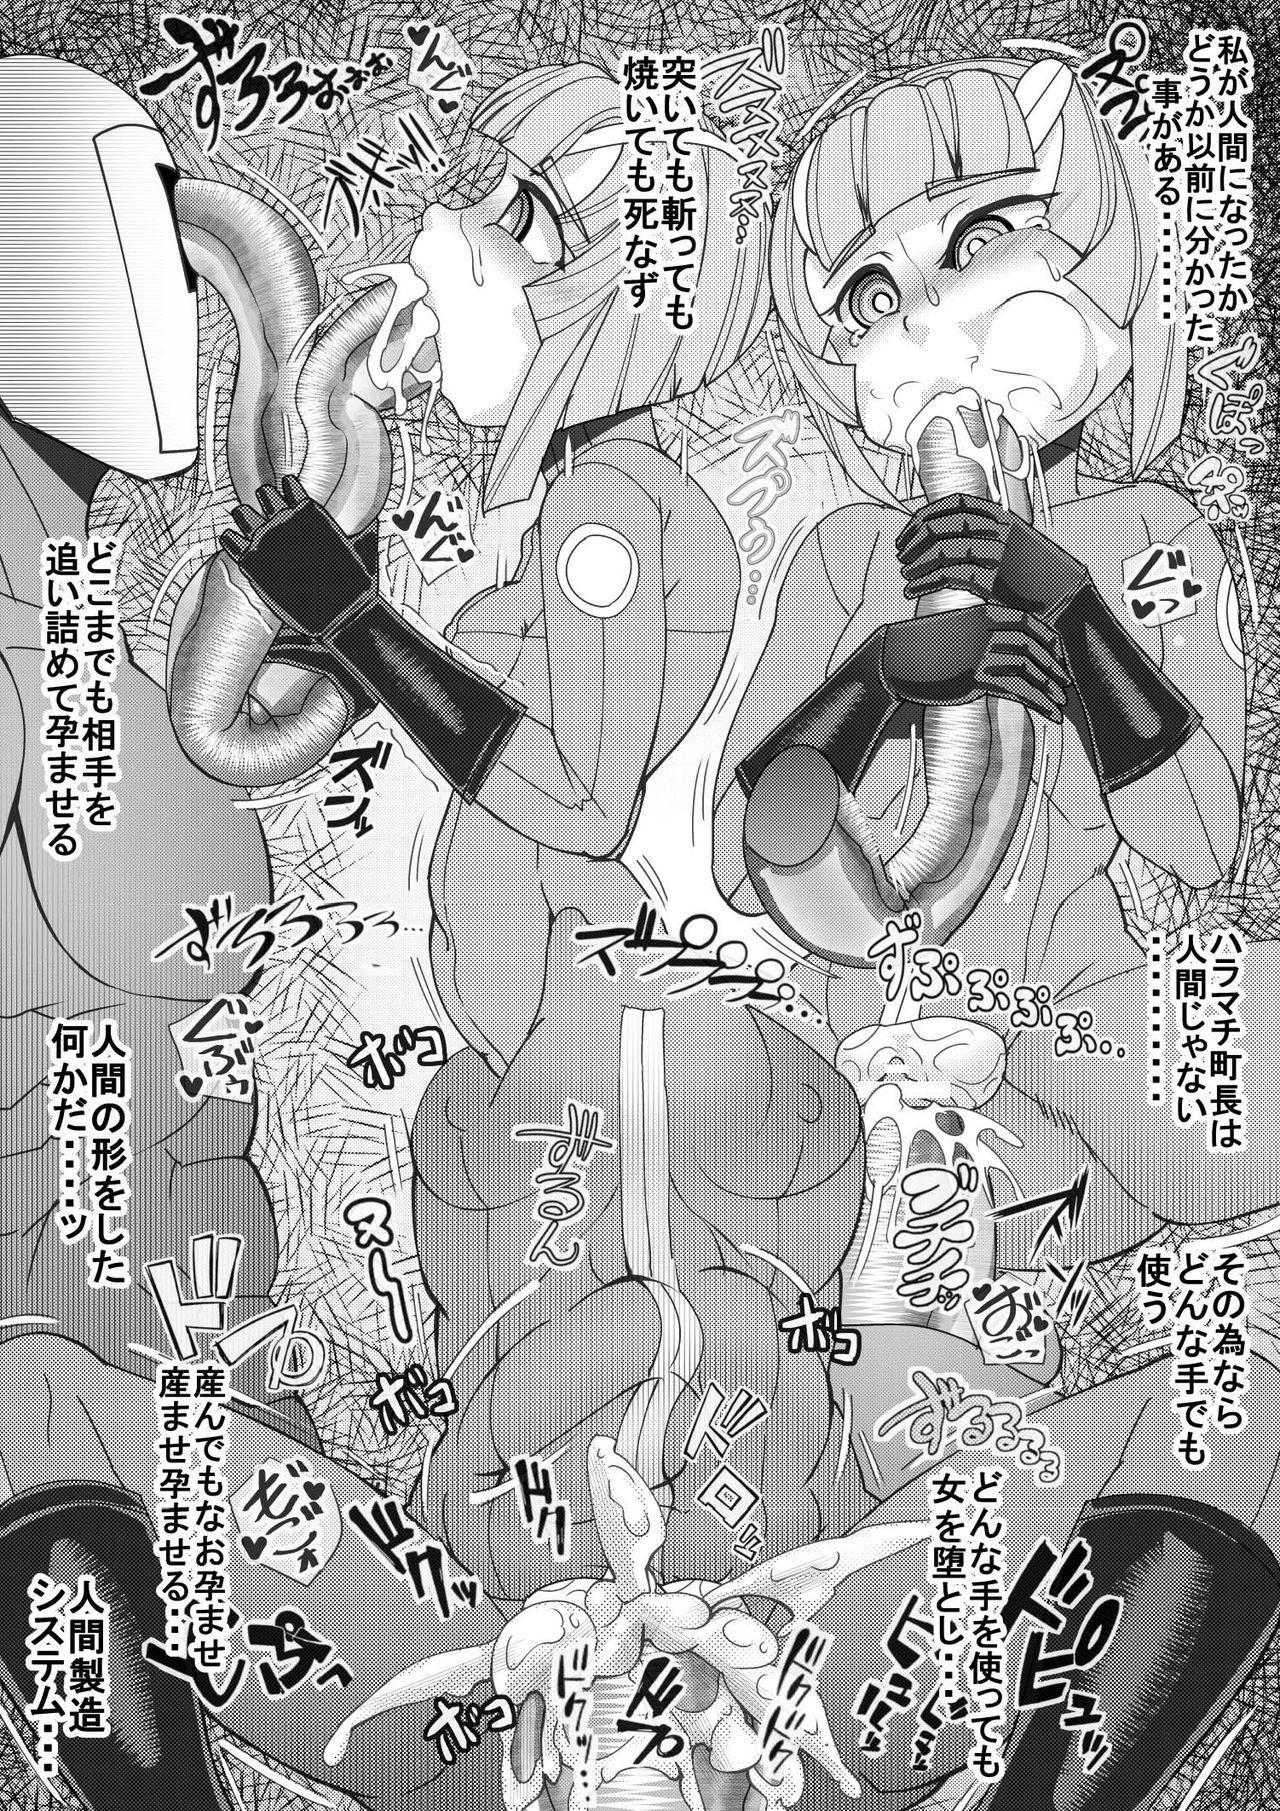 Haramachi 8 17